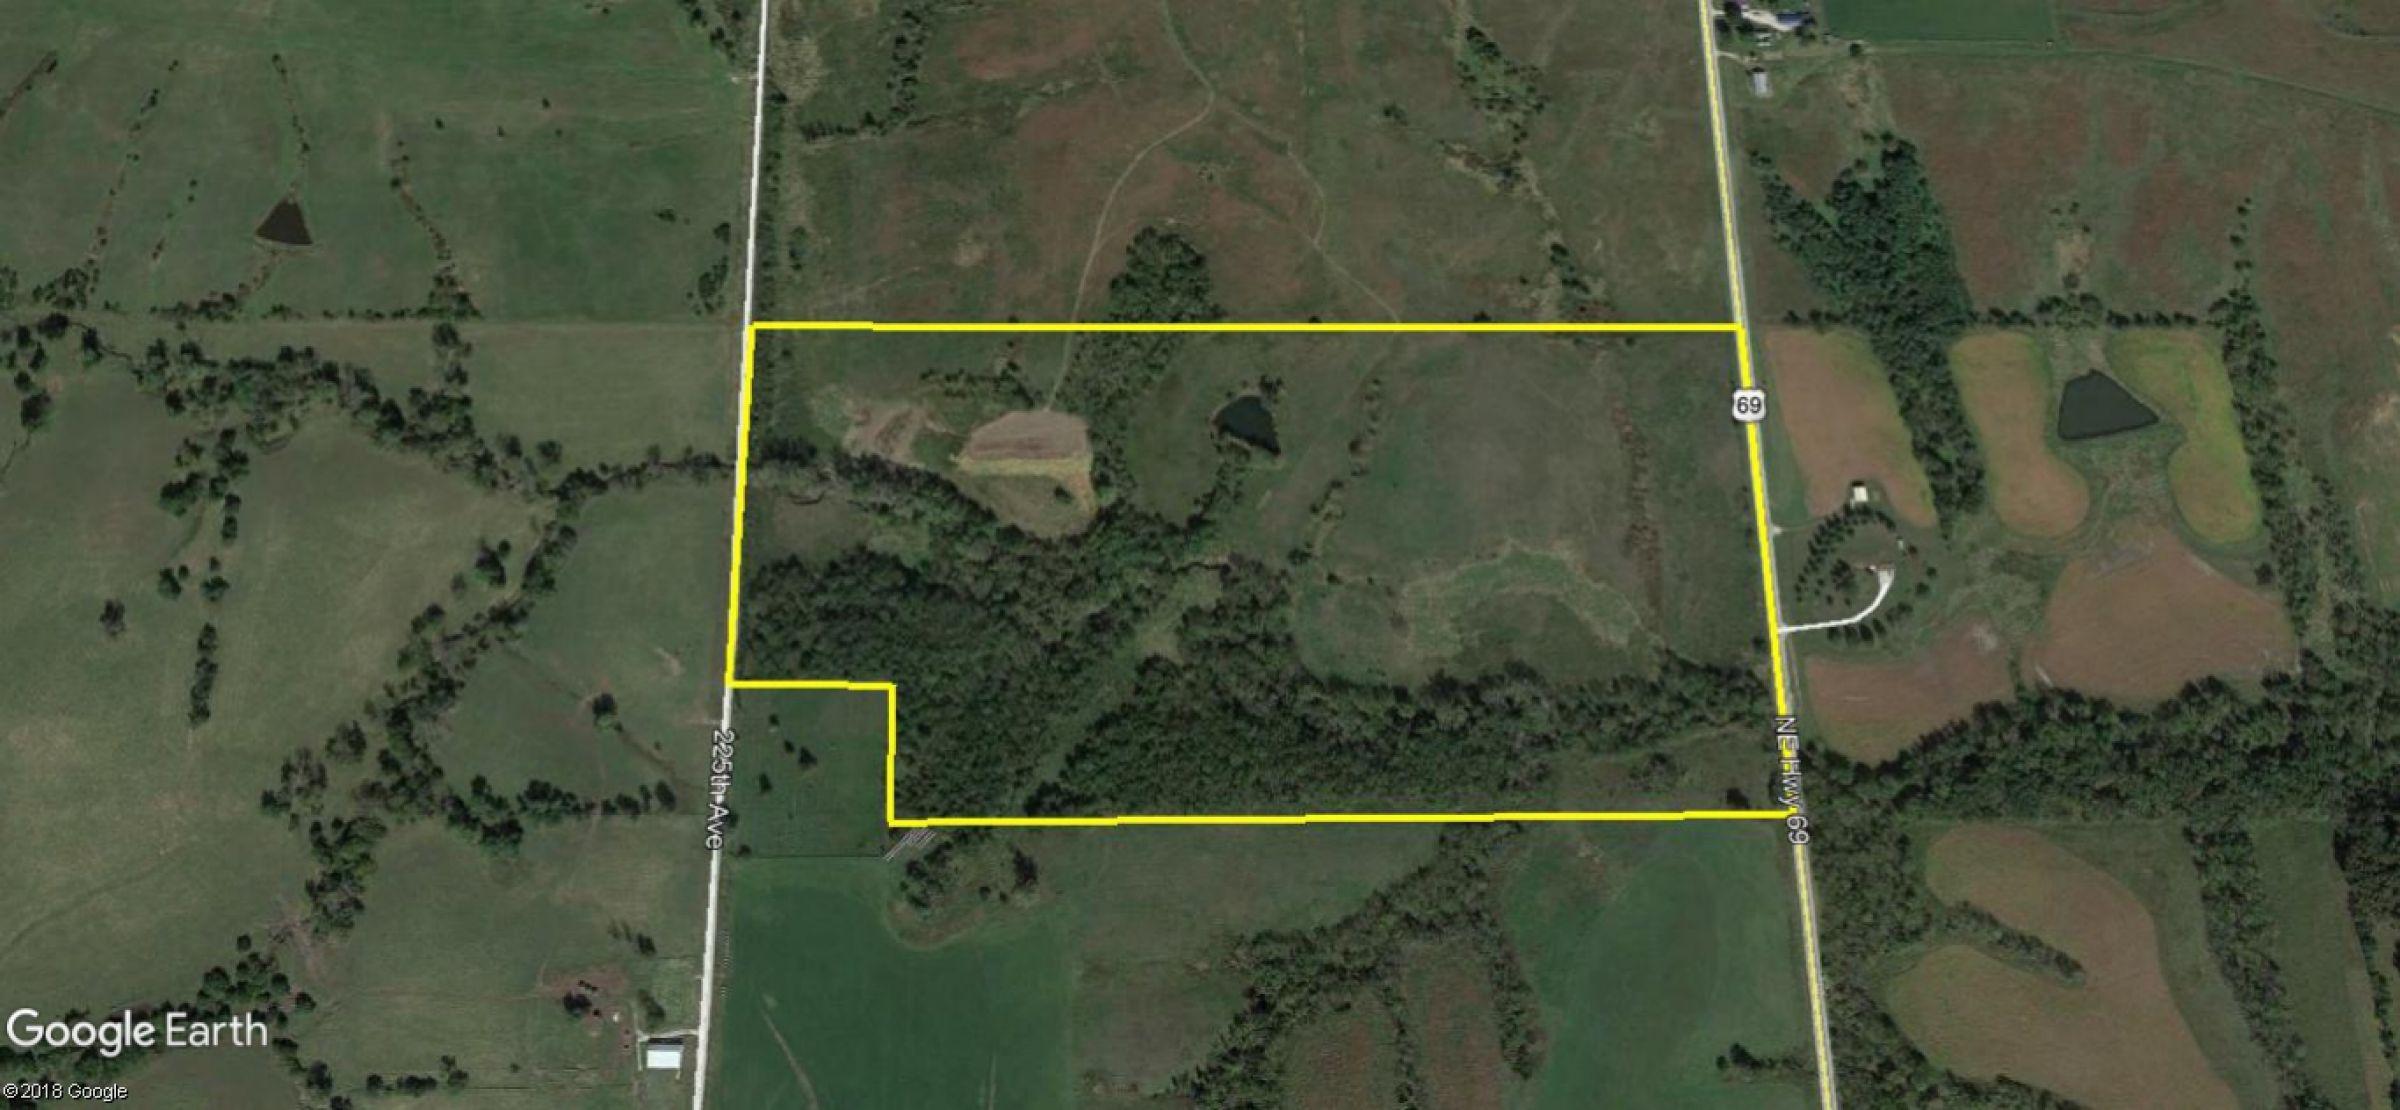 14497-78-acres-clarke-co-ia-0-2019-04-18-233707.jpg